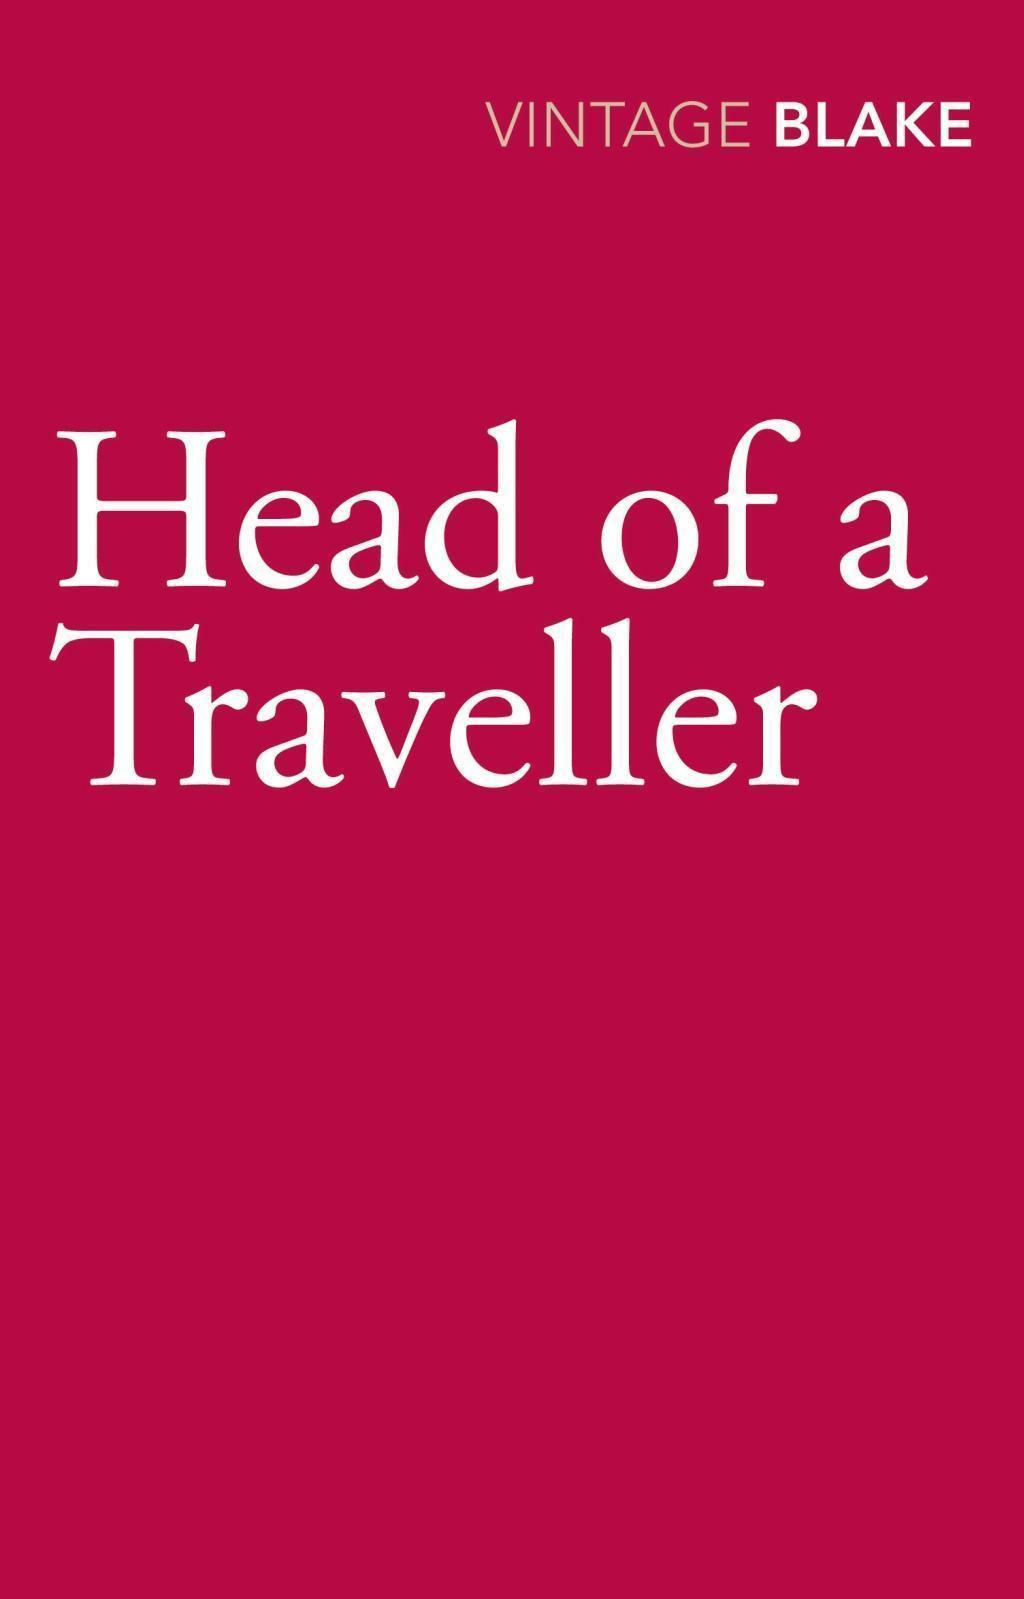 Head of a Traveller